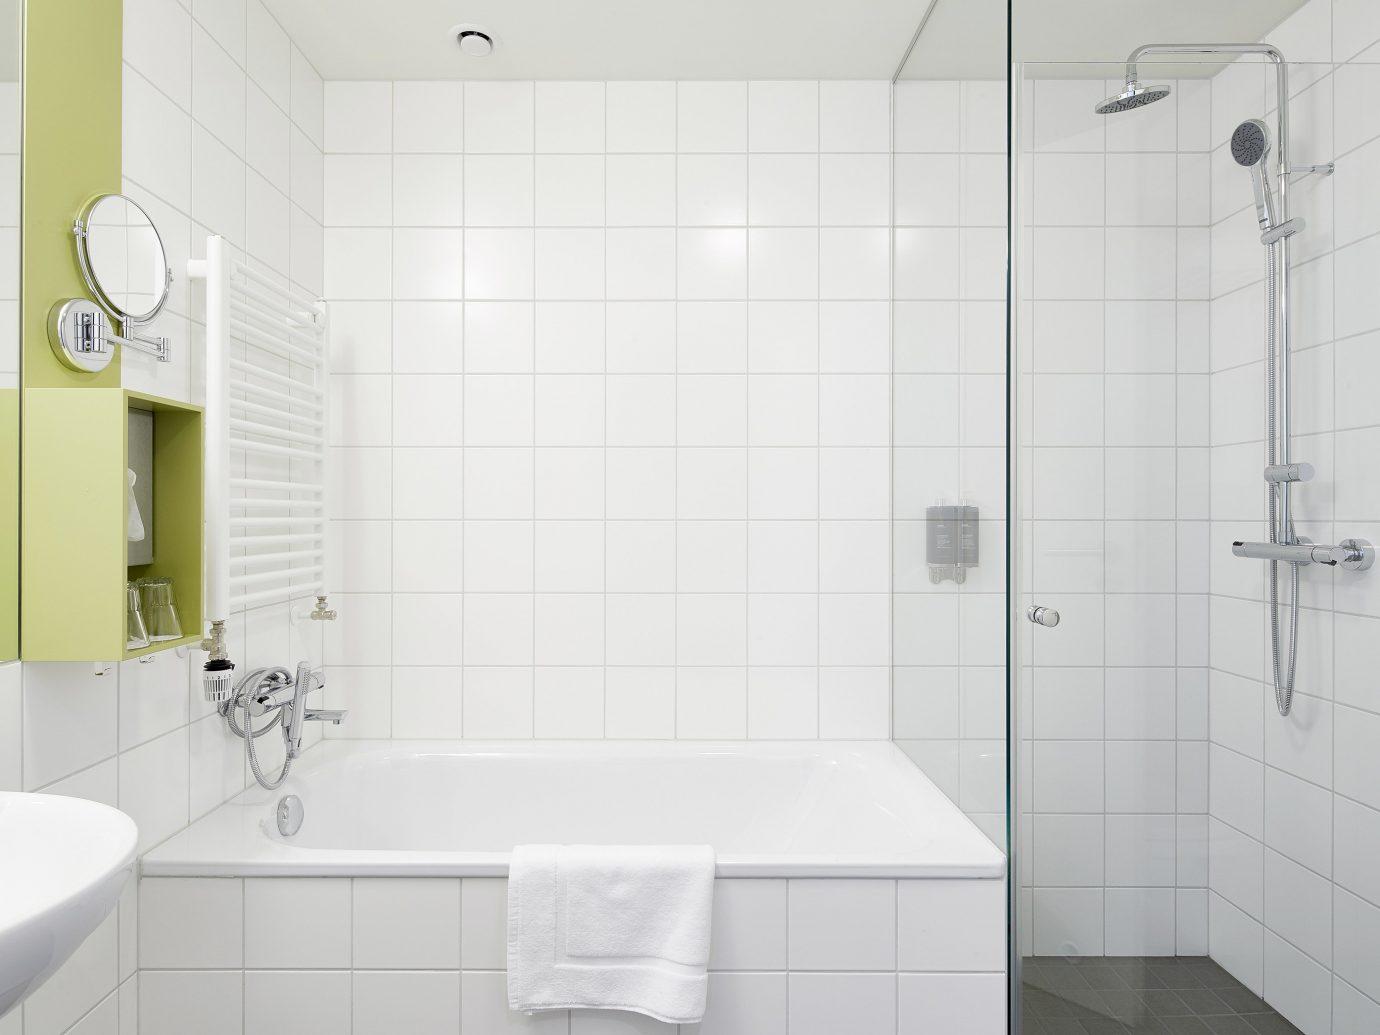 Boutique Hotels Hotels Iceland Reykjavík indoor bathroom wall room tile tap bathroom accessory plumbing fixture interior design bathroom cabinet floor product design bathroom sink toilet seat angle toilet product ceramic sink shower tiled